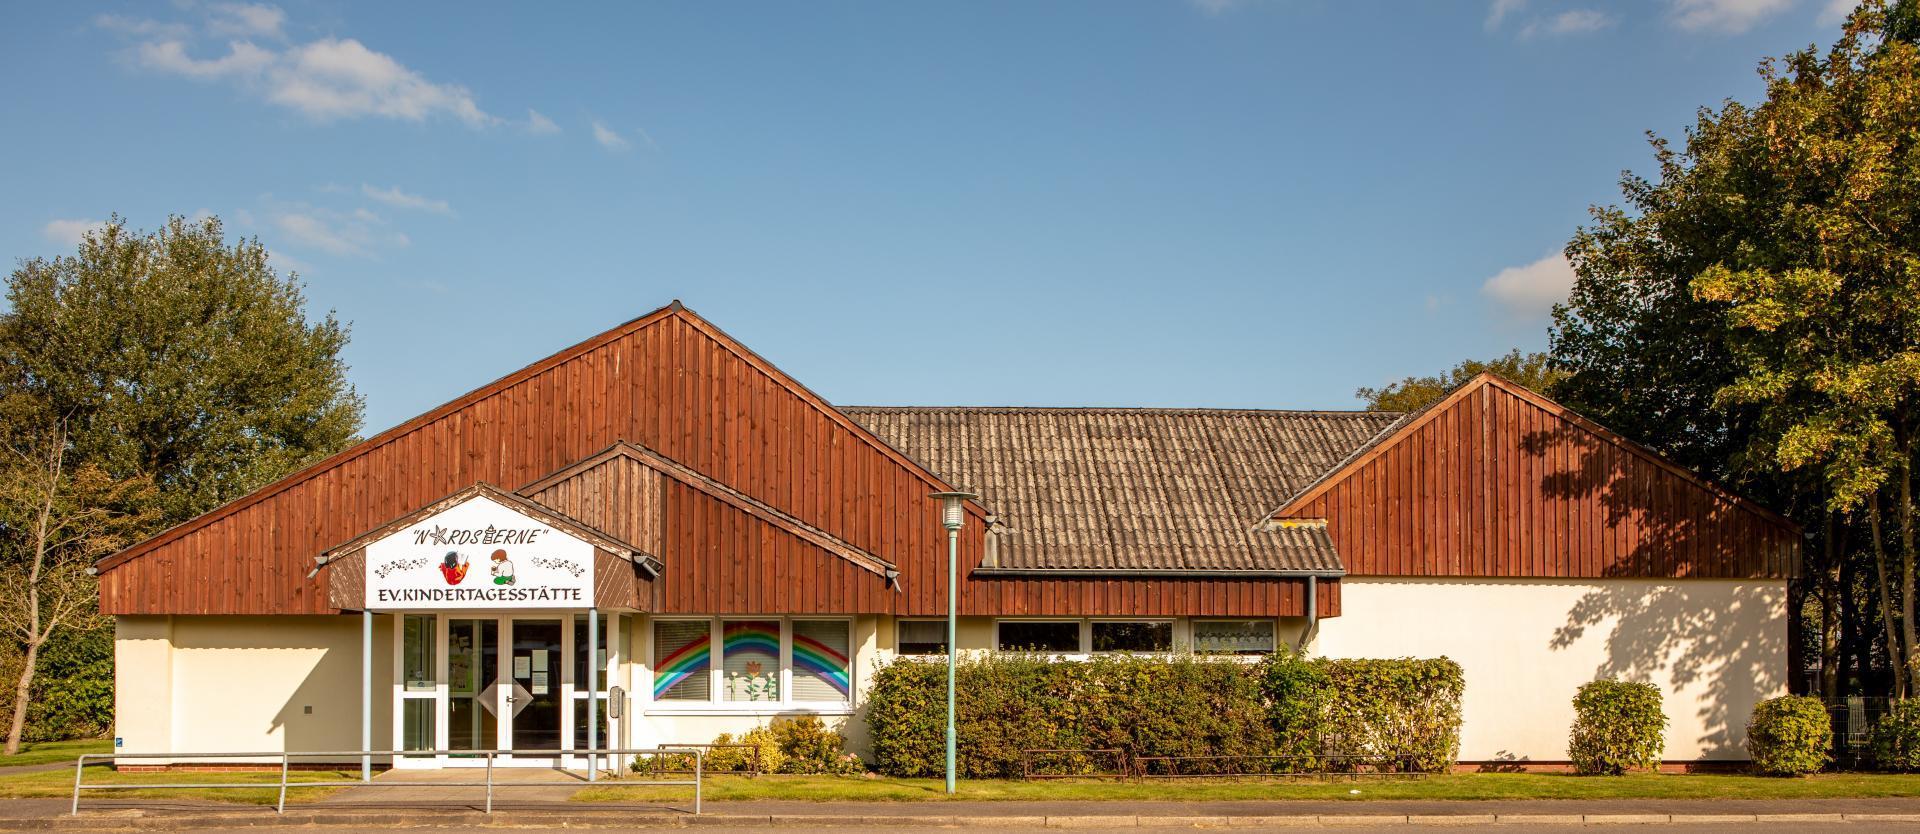 Evangelische Kindertagesstätte Nordsterne